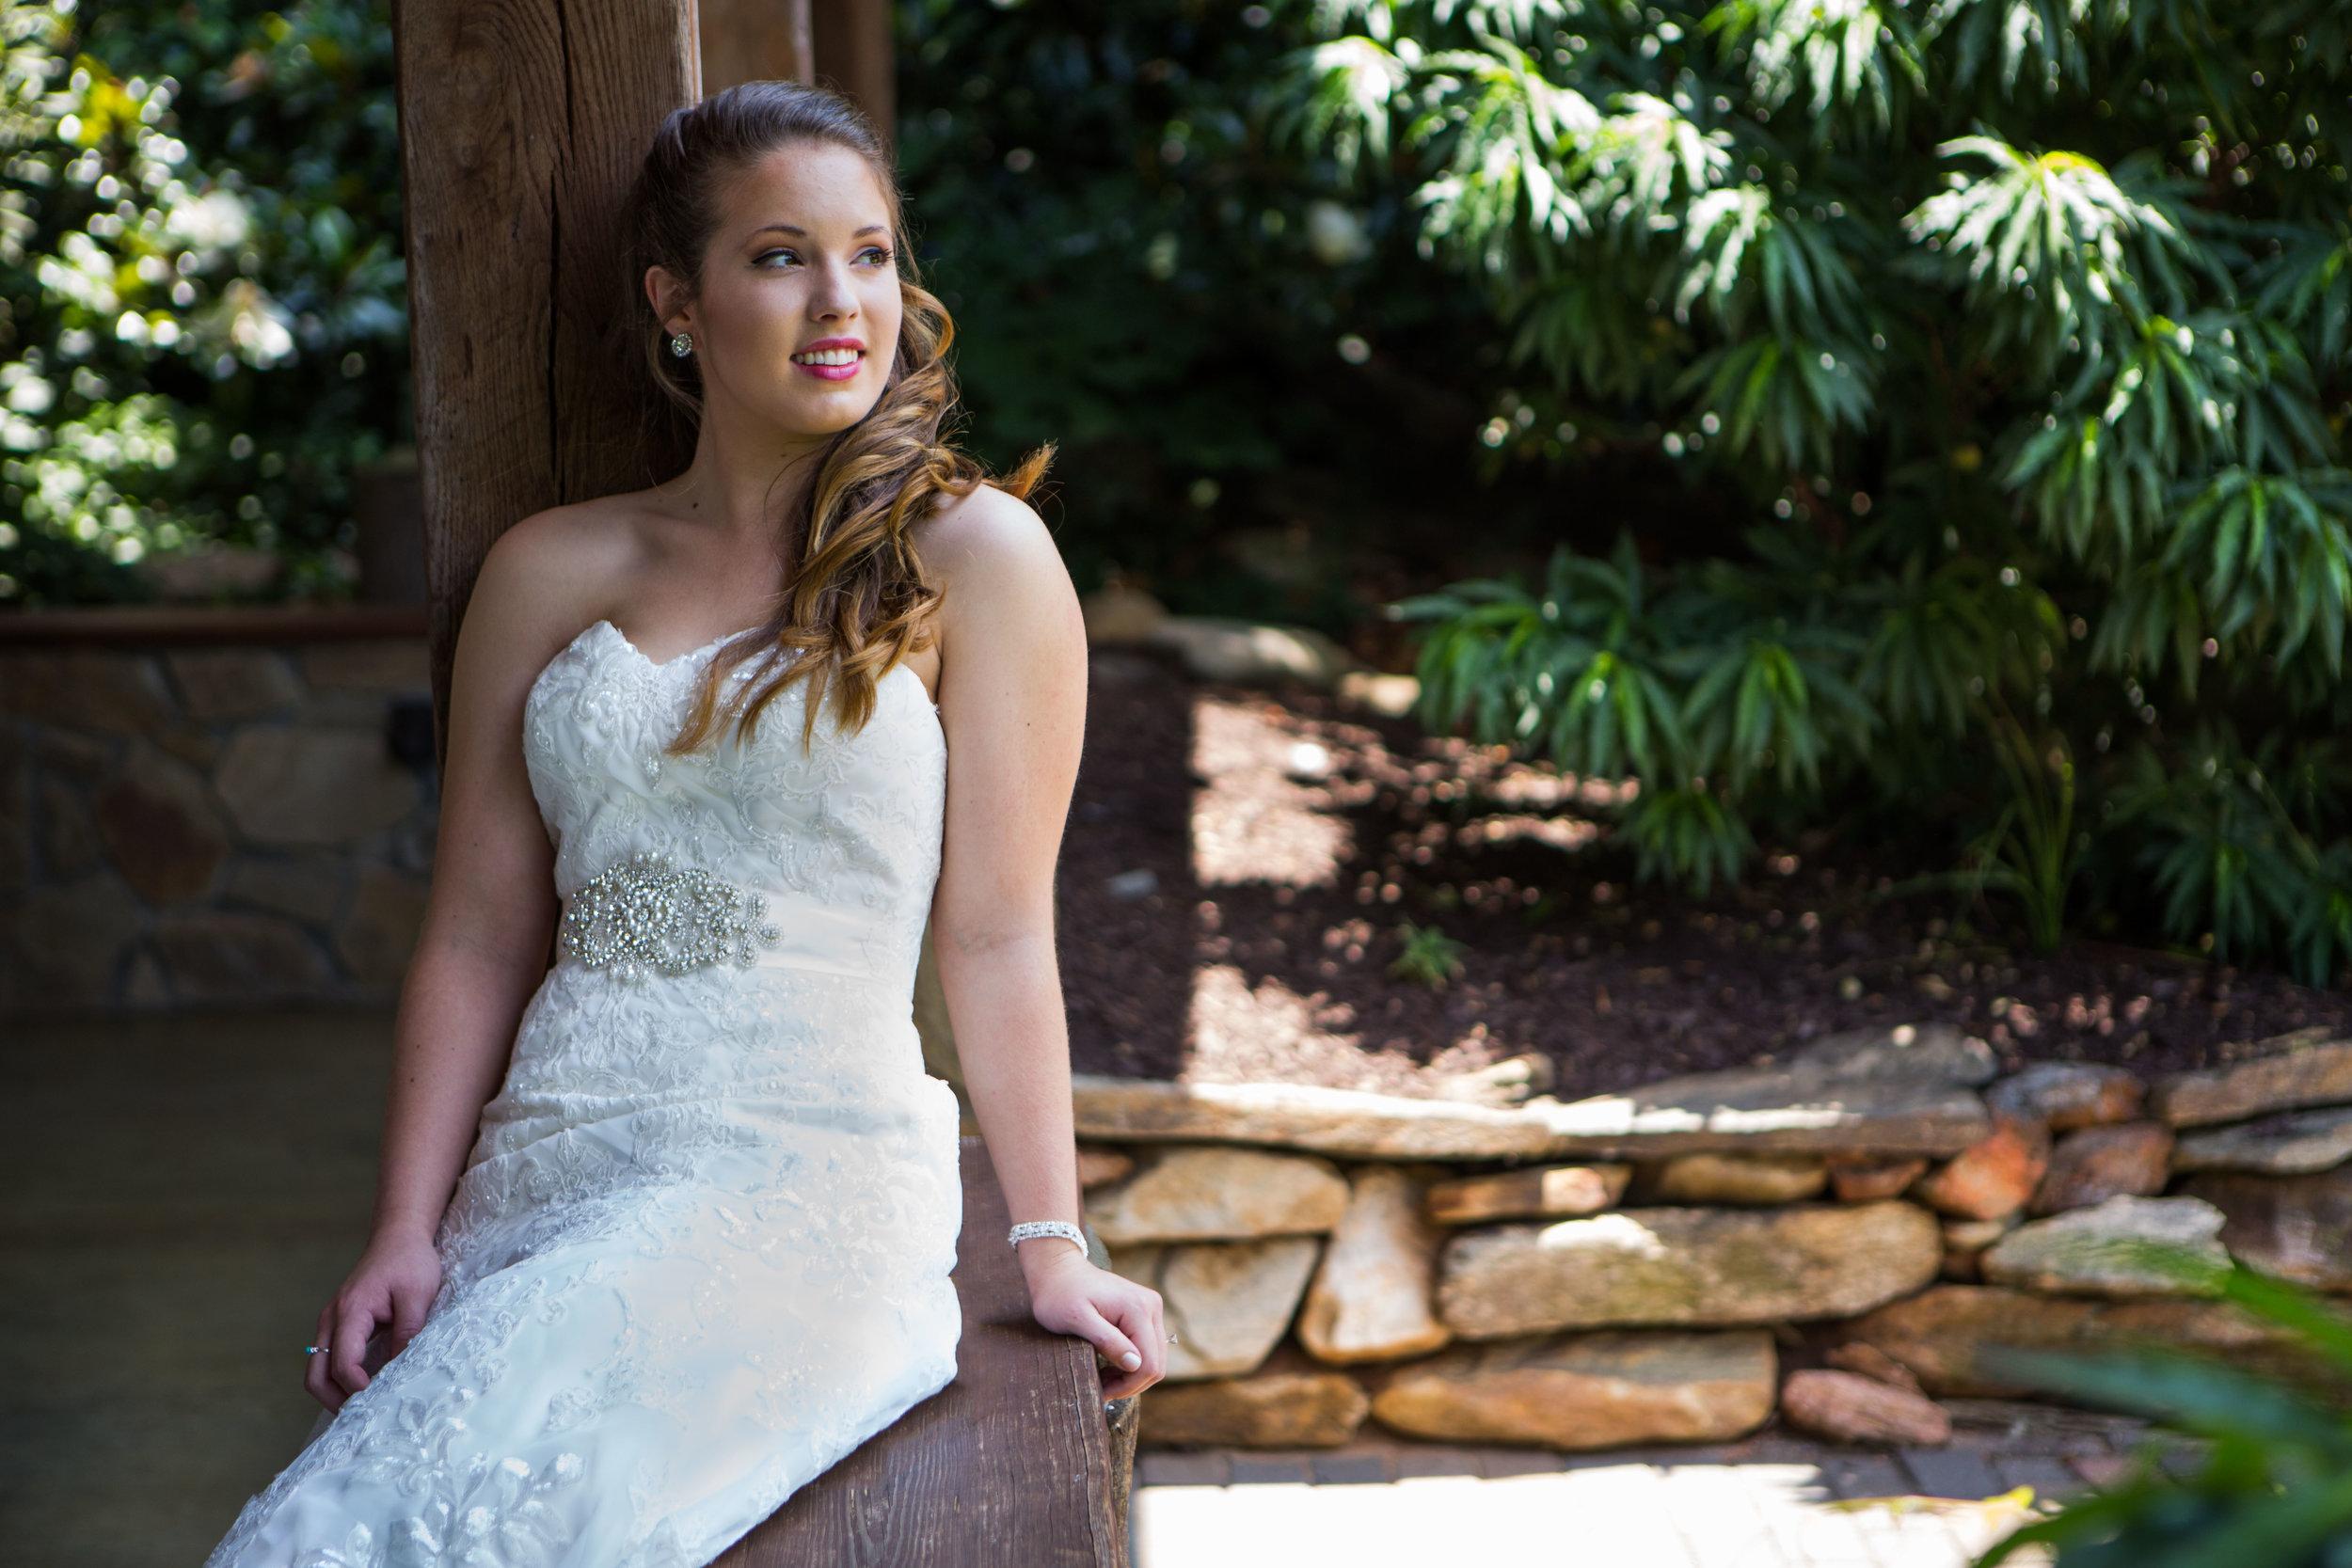 060416_Norris_Smith_Wedding_CF_1570-Edit.jpg